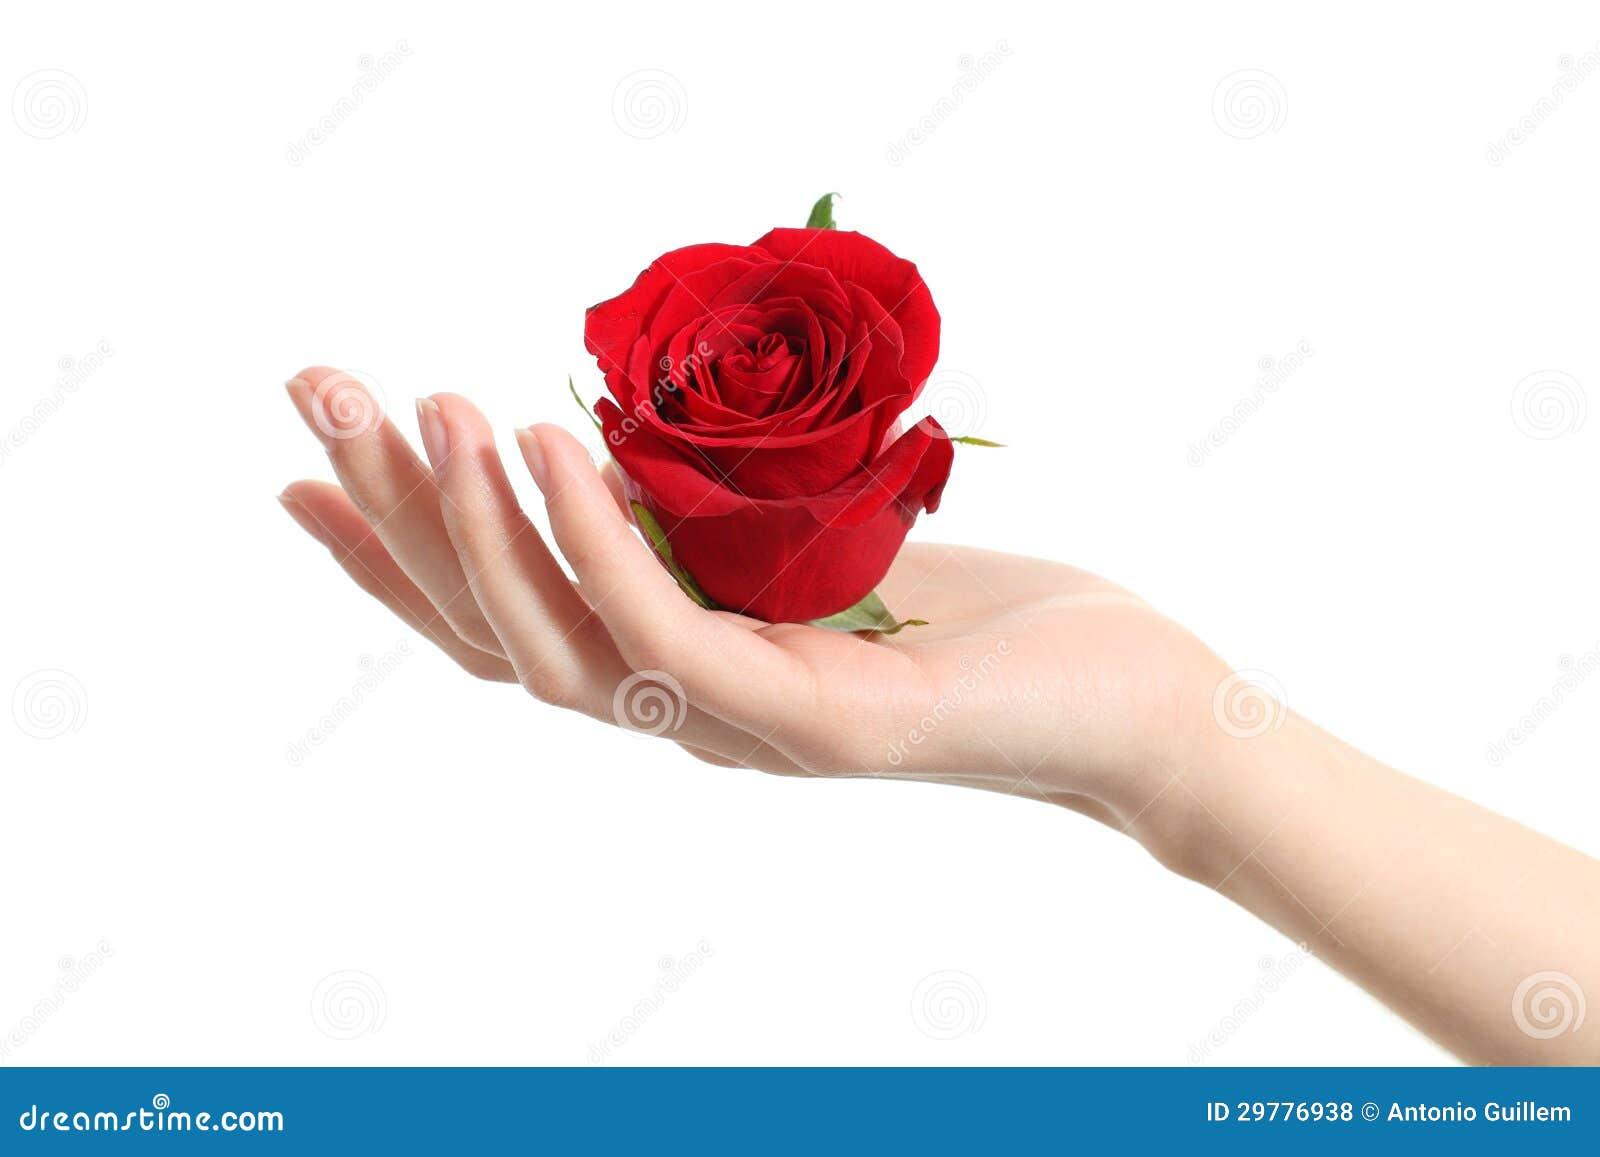 mujer y rosa roja - photo #2